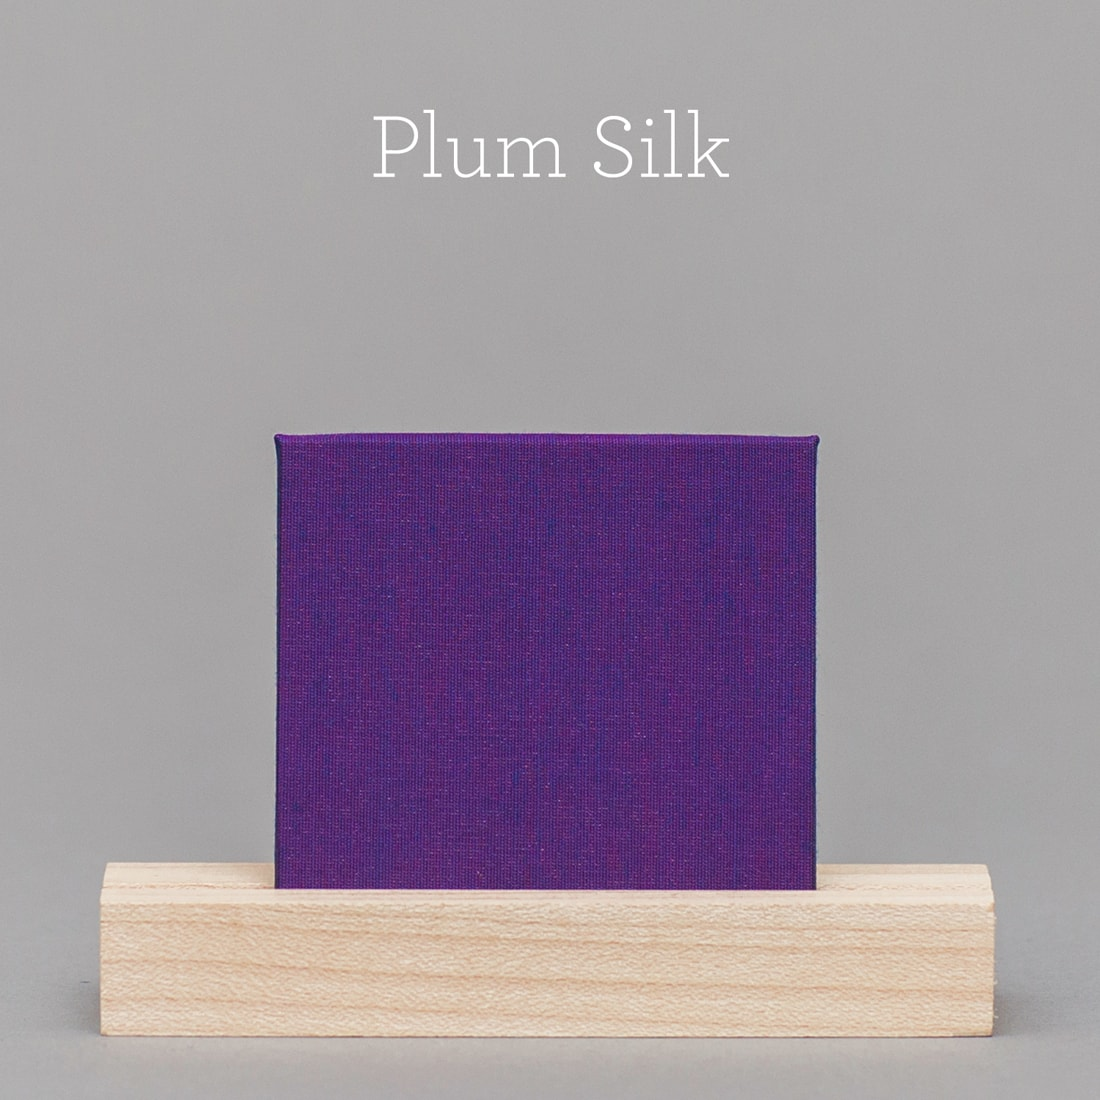 PlumSilk